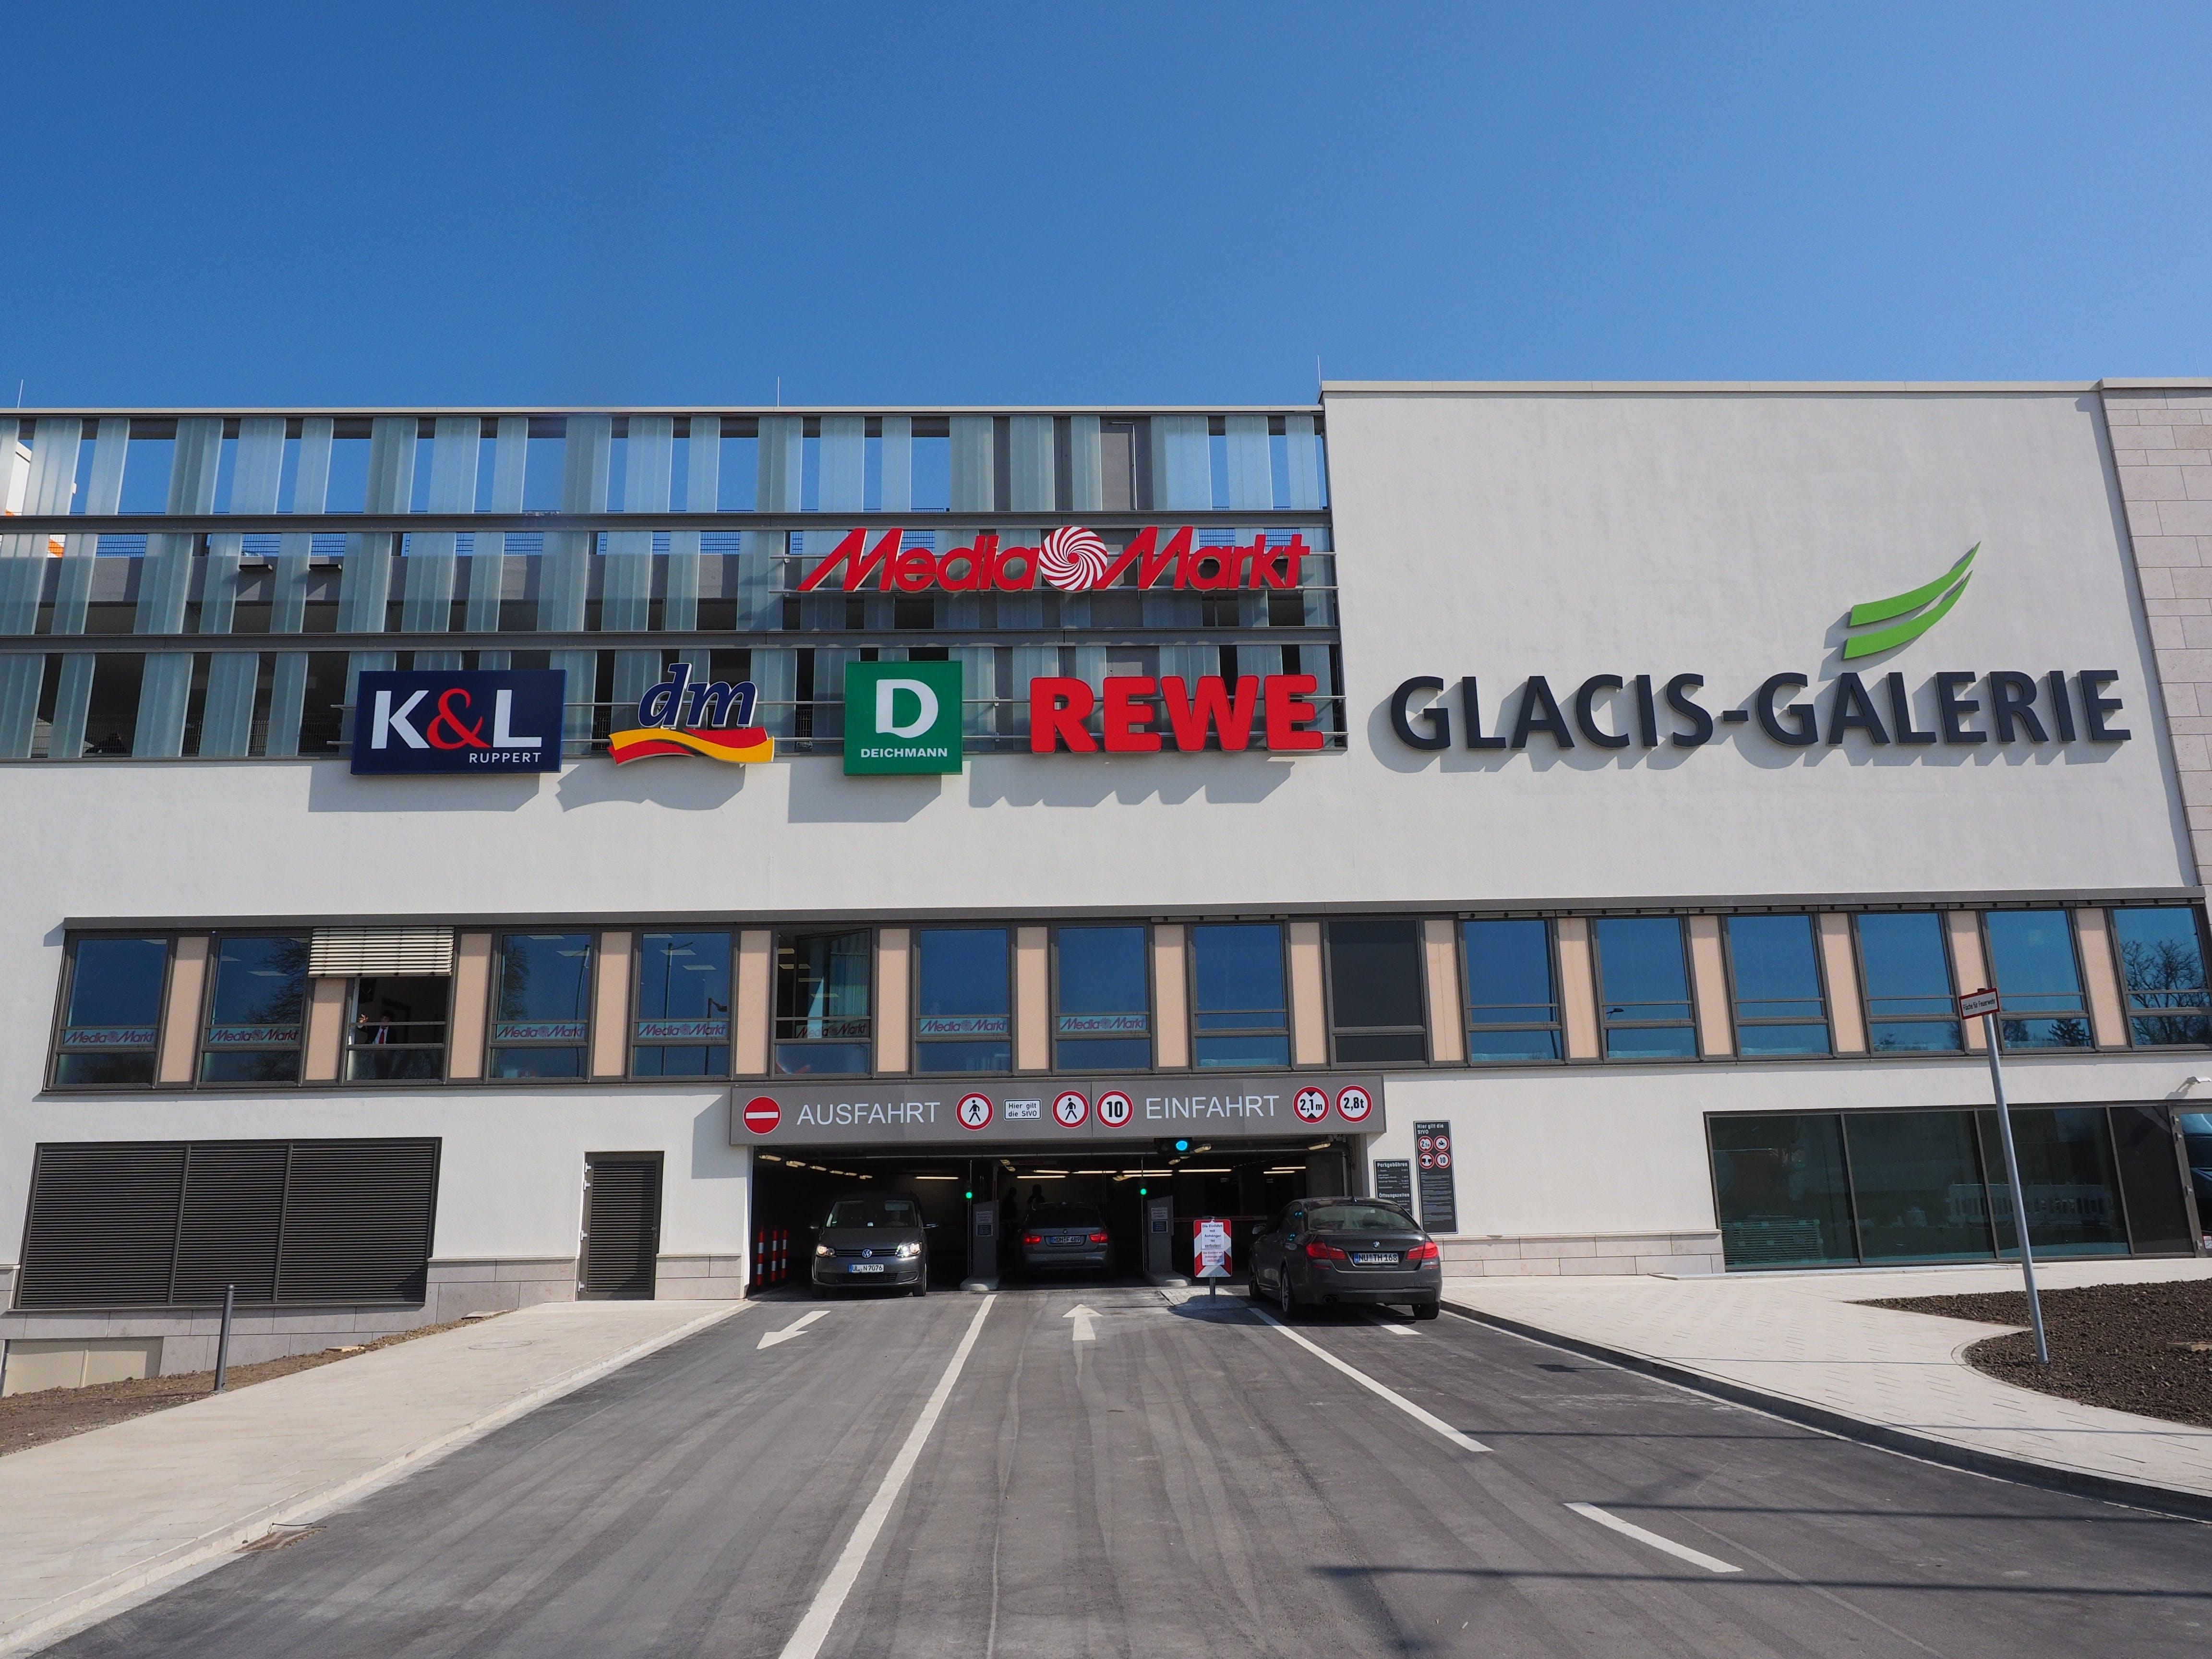 K&l D Rewe Glacis-galareie Store